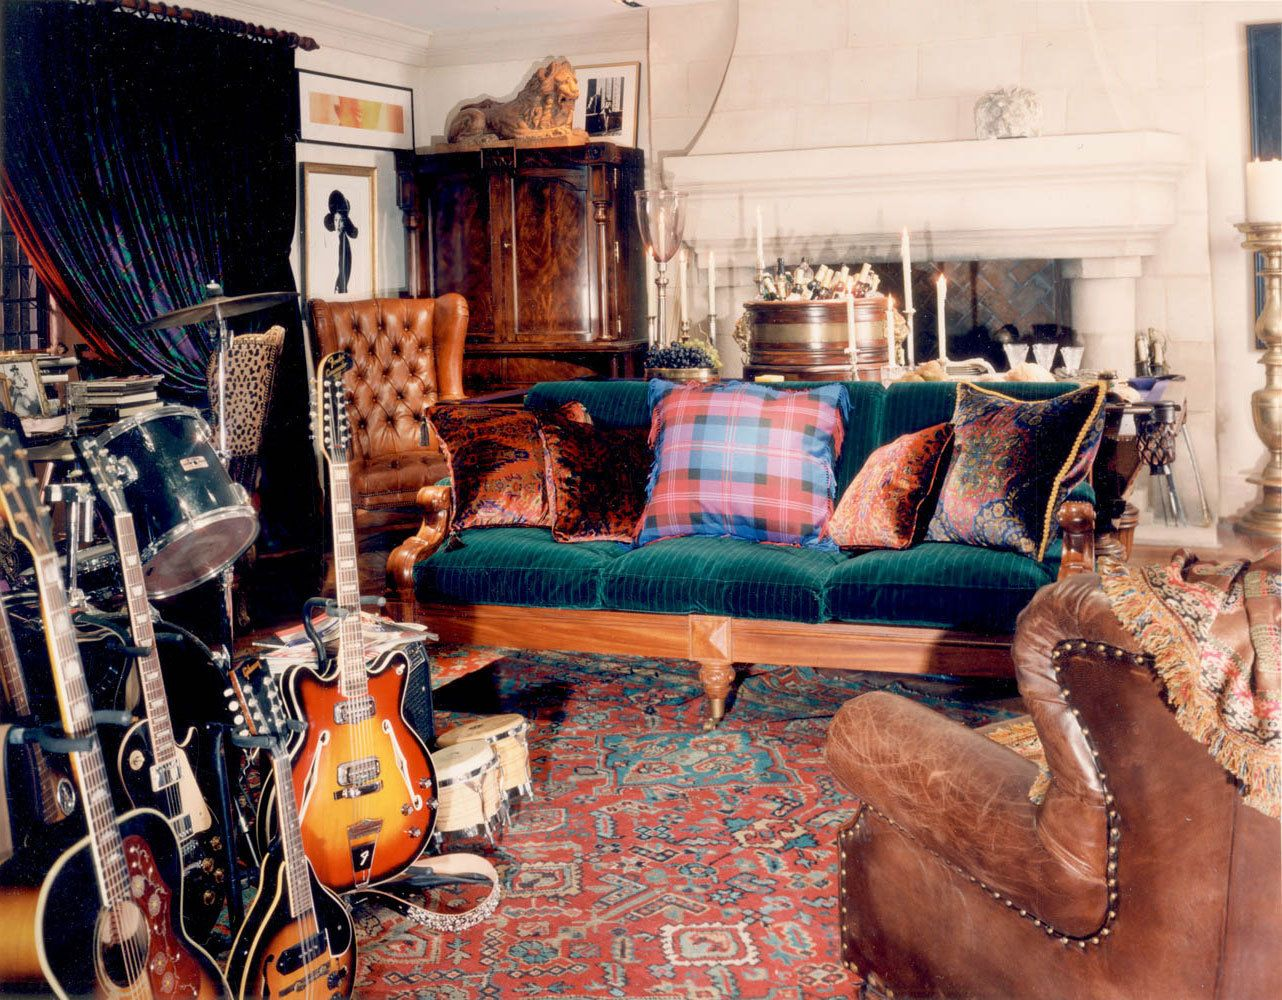 1ralph_lauren_home_furnishings_showroom_0086.jpg